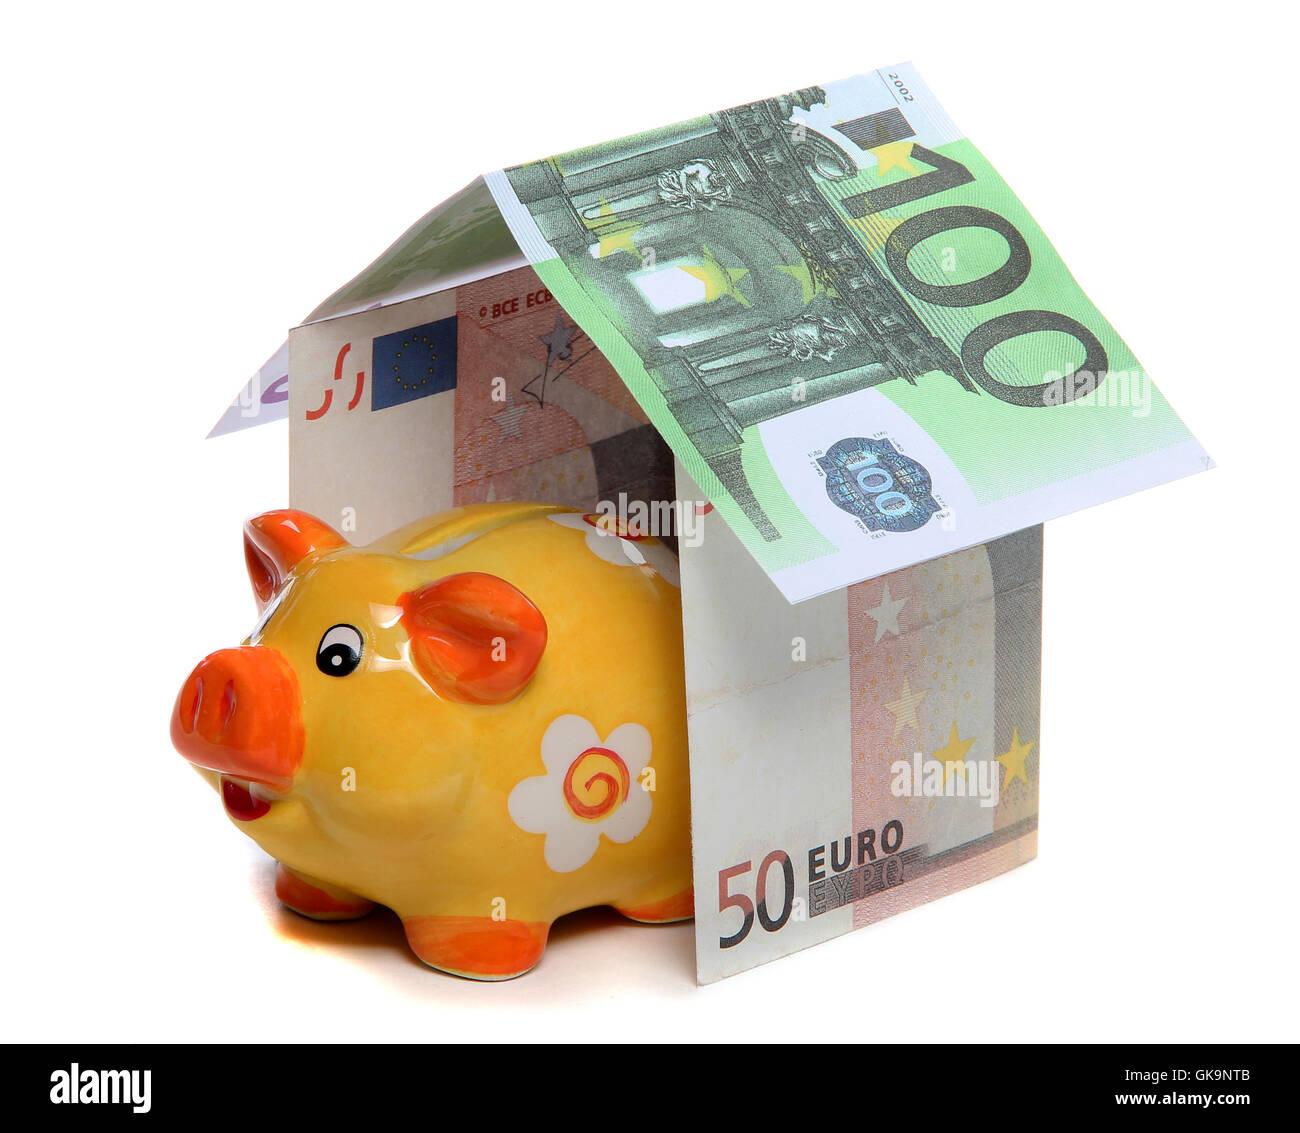 bank lending institution house - Stock Image